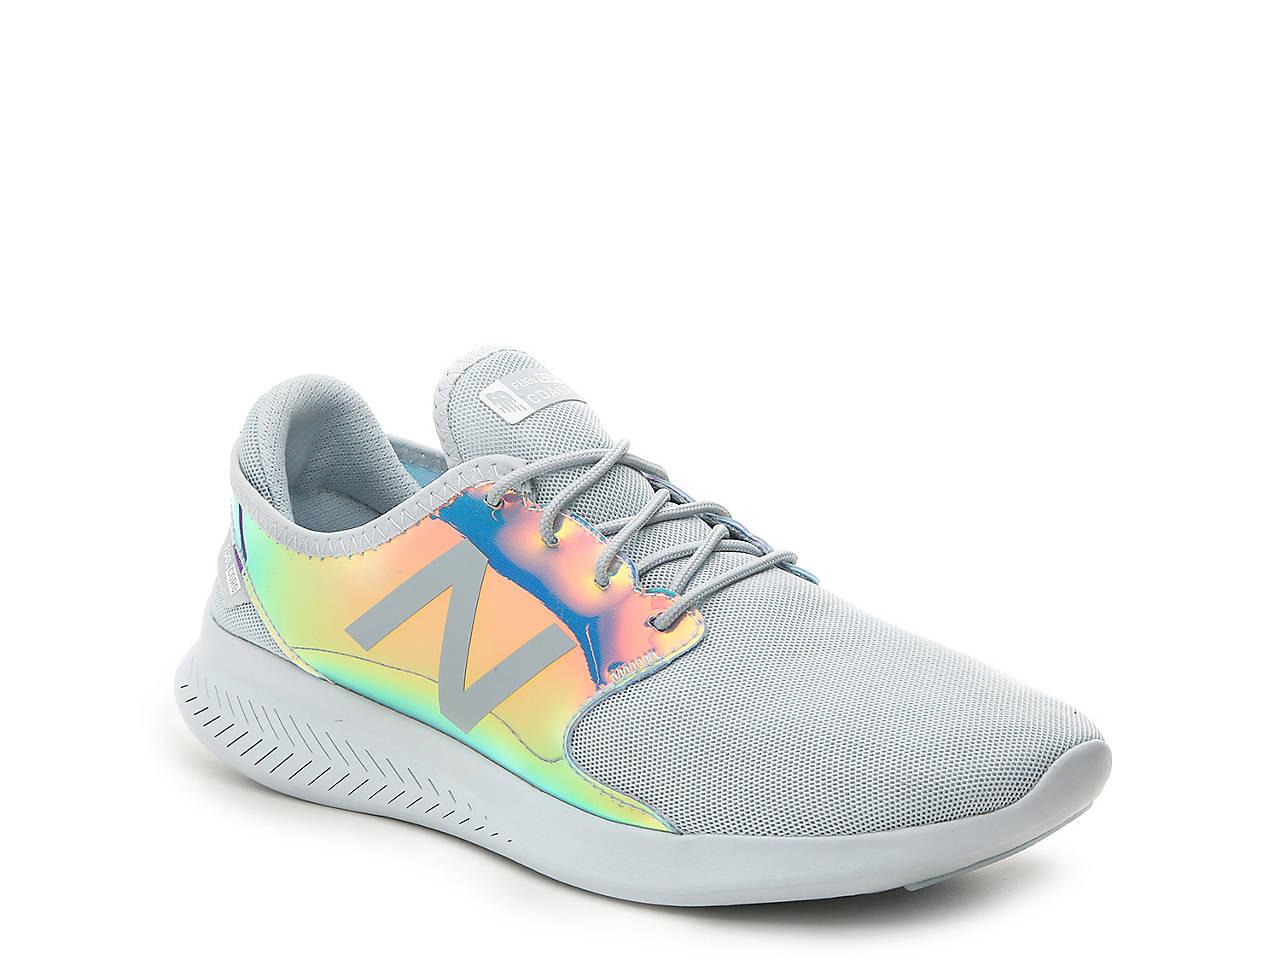 New Balance Fuel Core Coast V3 Running Sneaker xLPWwT